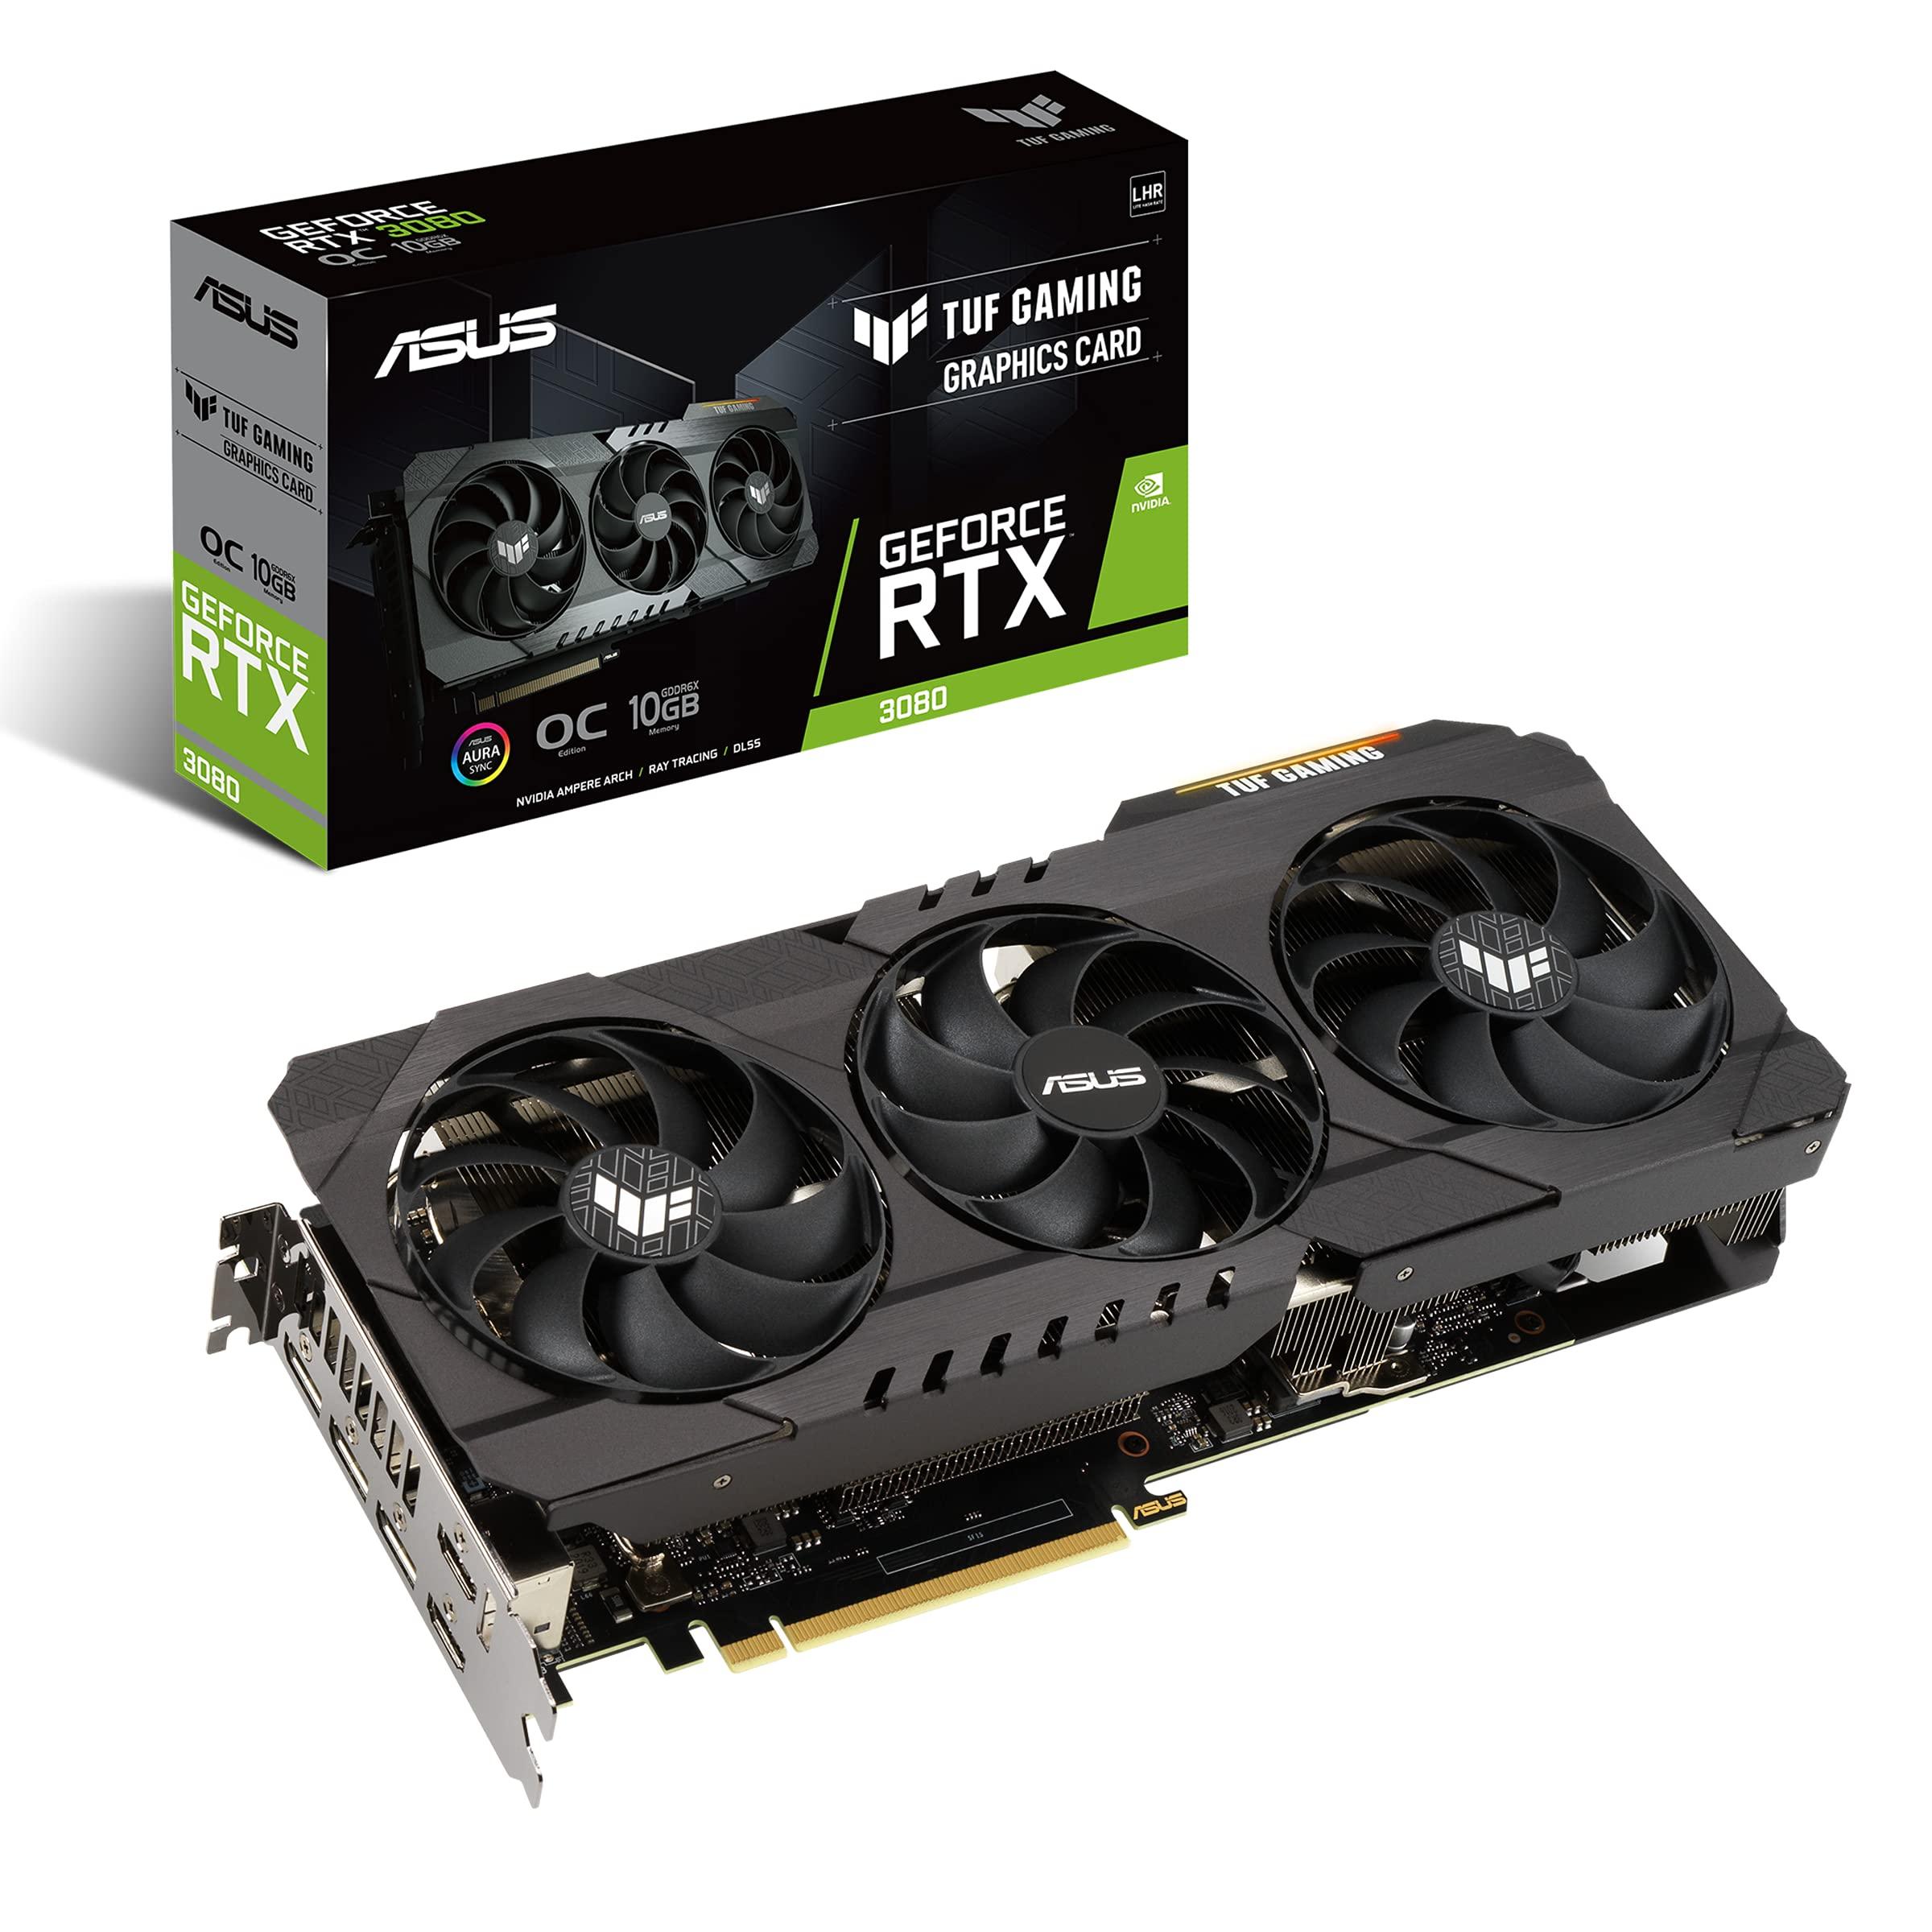 ASUS TUF Gaming NVIDIA GeForce RTX 3080 V2 OC Edition Graphics Card (PCIe 4.0, 10GB GDDR6X, LHR, HDMI 2.1, DisplayPort 1.4a, Dual Ball Fan Bearings, Military-Grade Certification, GPU Tweak II)